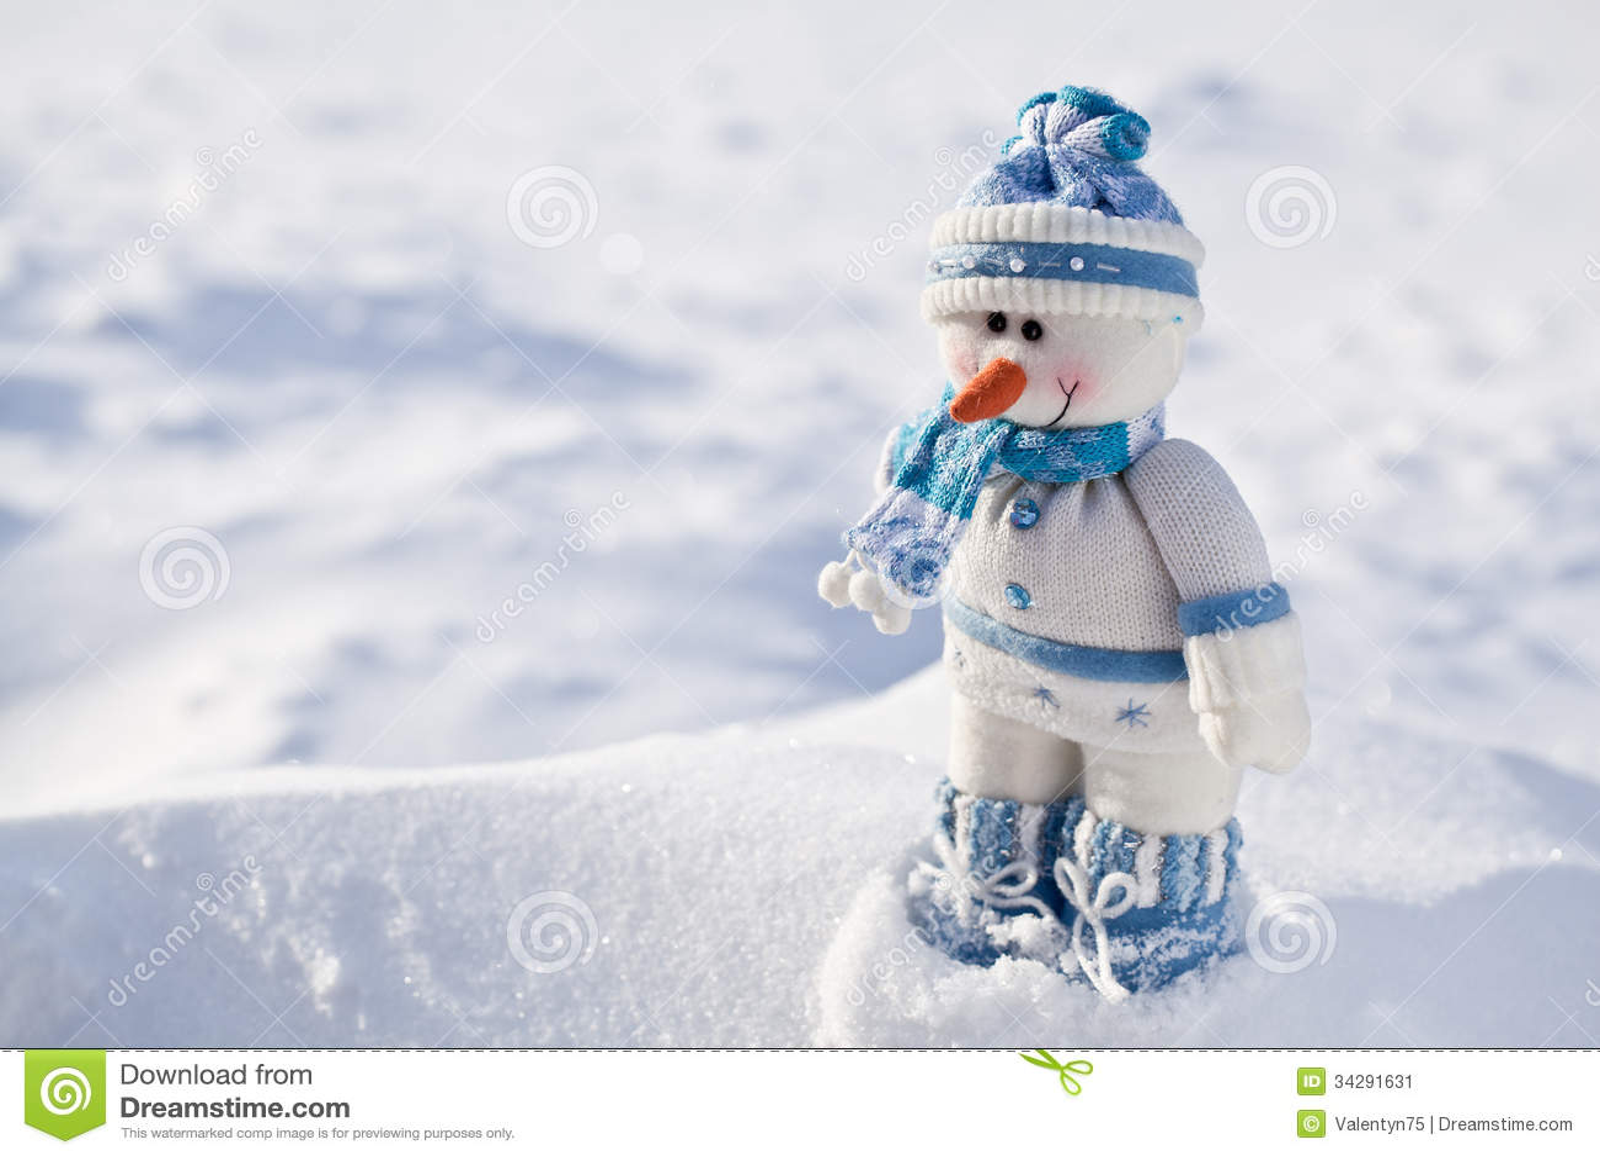 ... white carrot nose template snowman mouth clipart snowman hat clipart